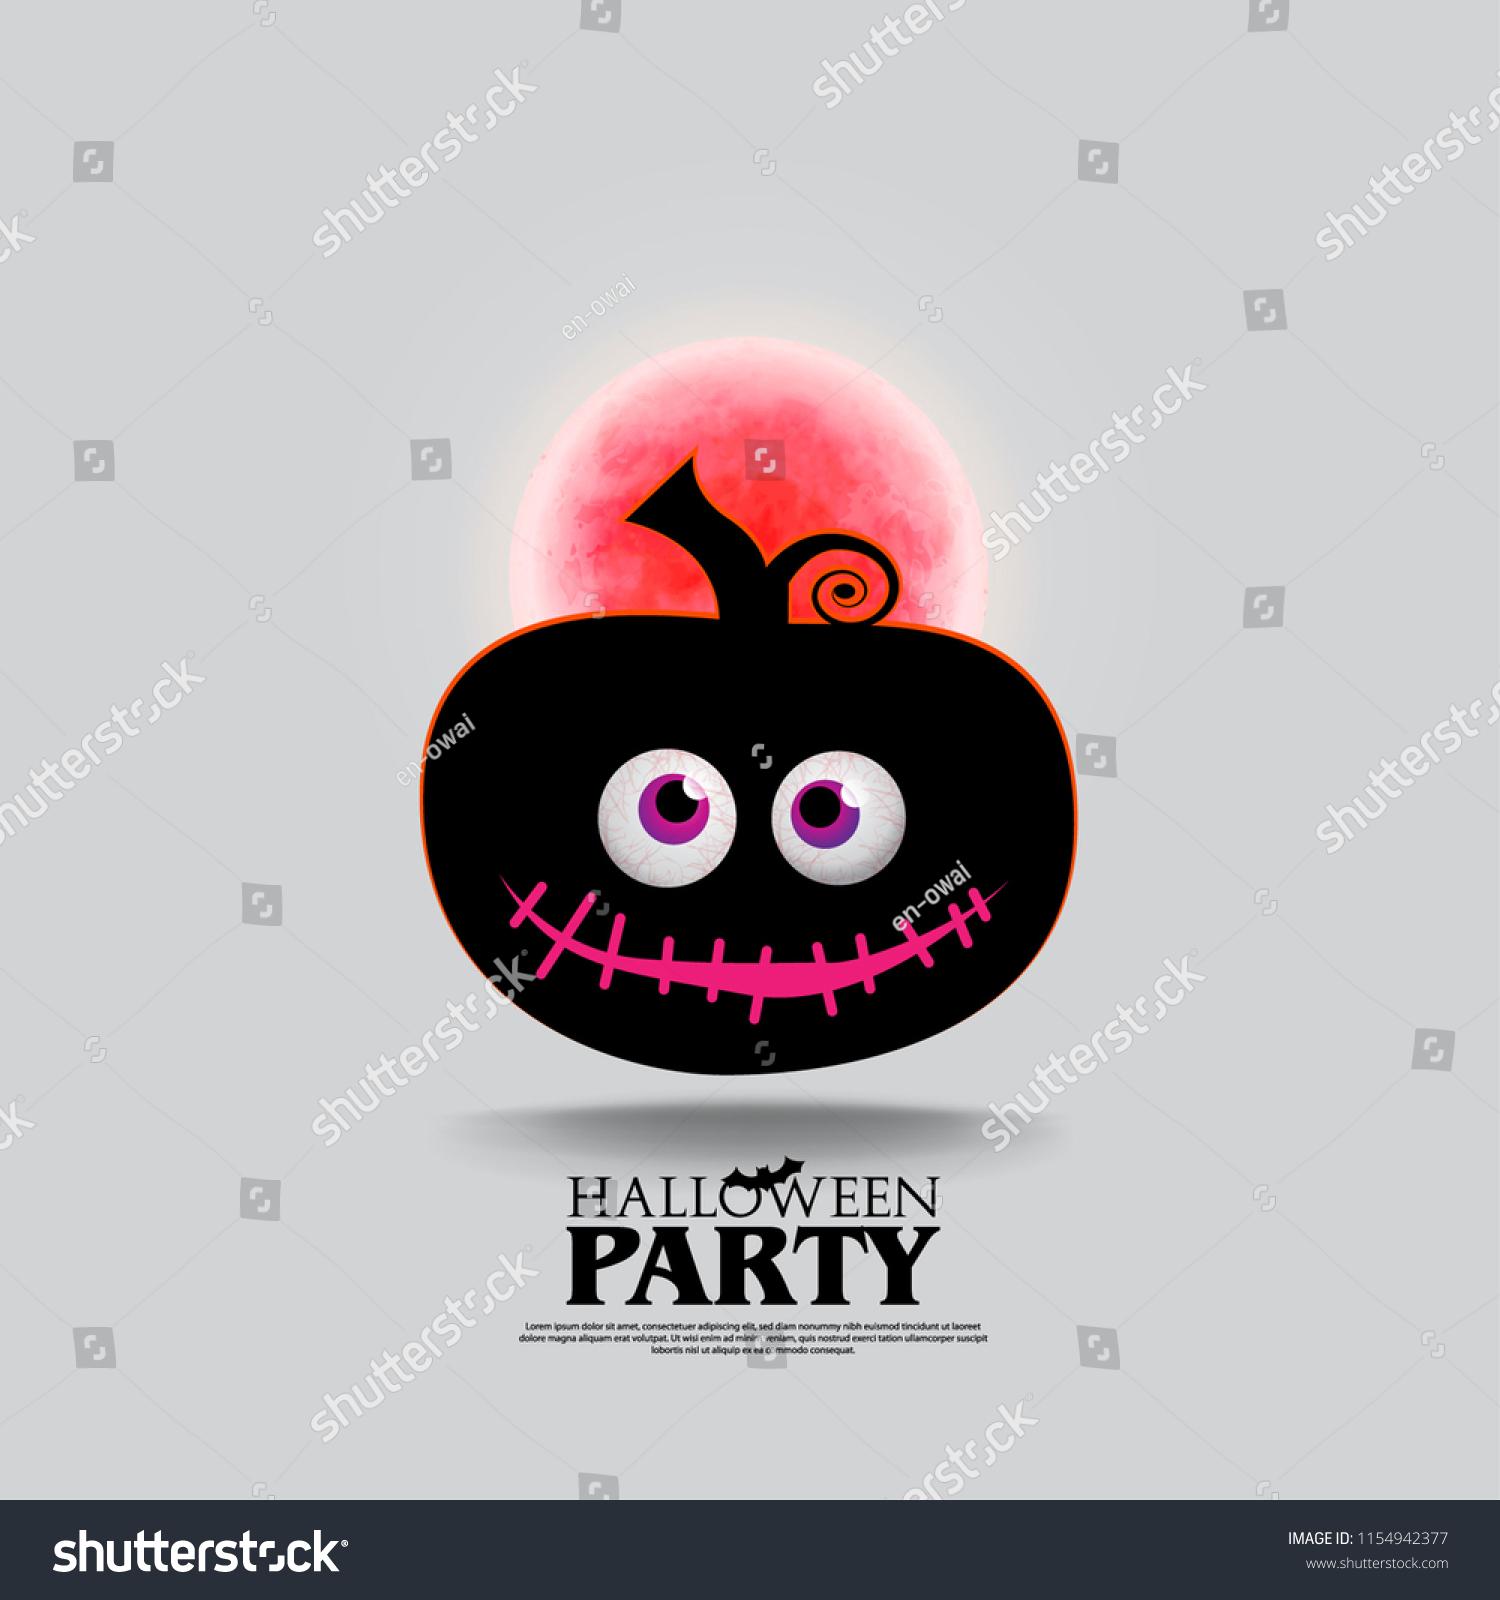 Halloween Creative Ads.Cute Pumpkin Halloween Layout Cover Minimalist Creative